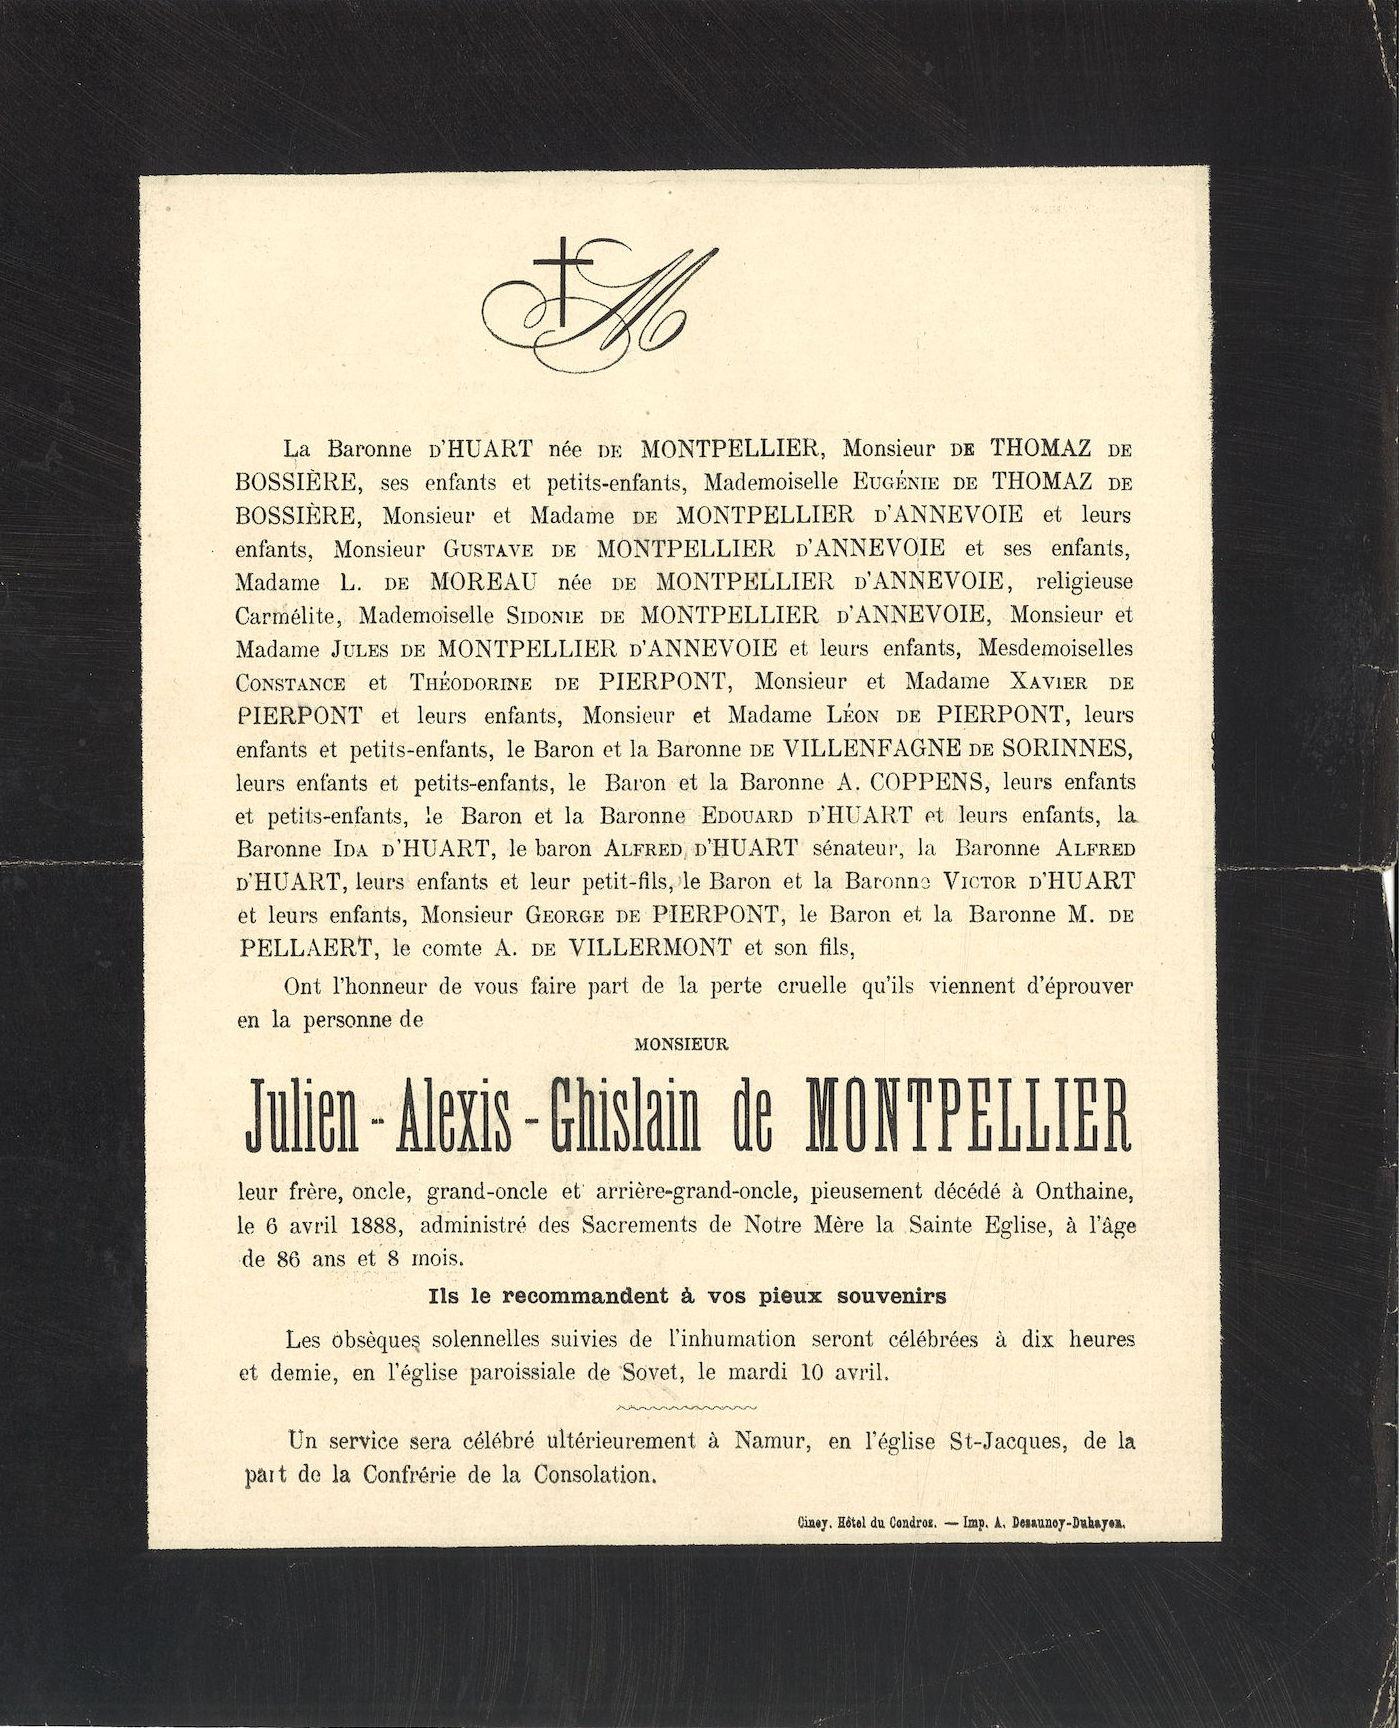 Julien-Alexis-Ghislain de Montpellier